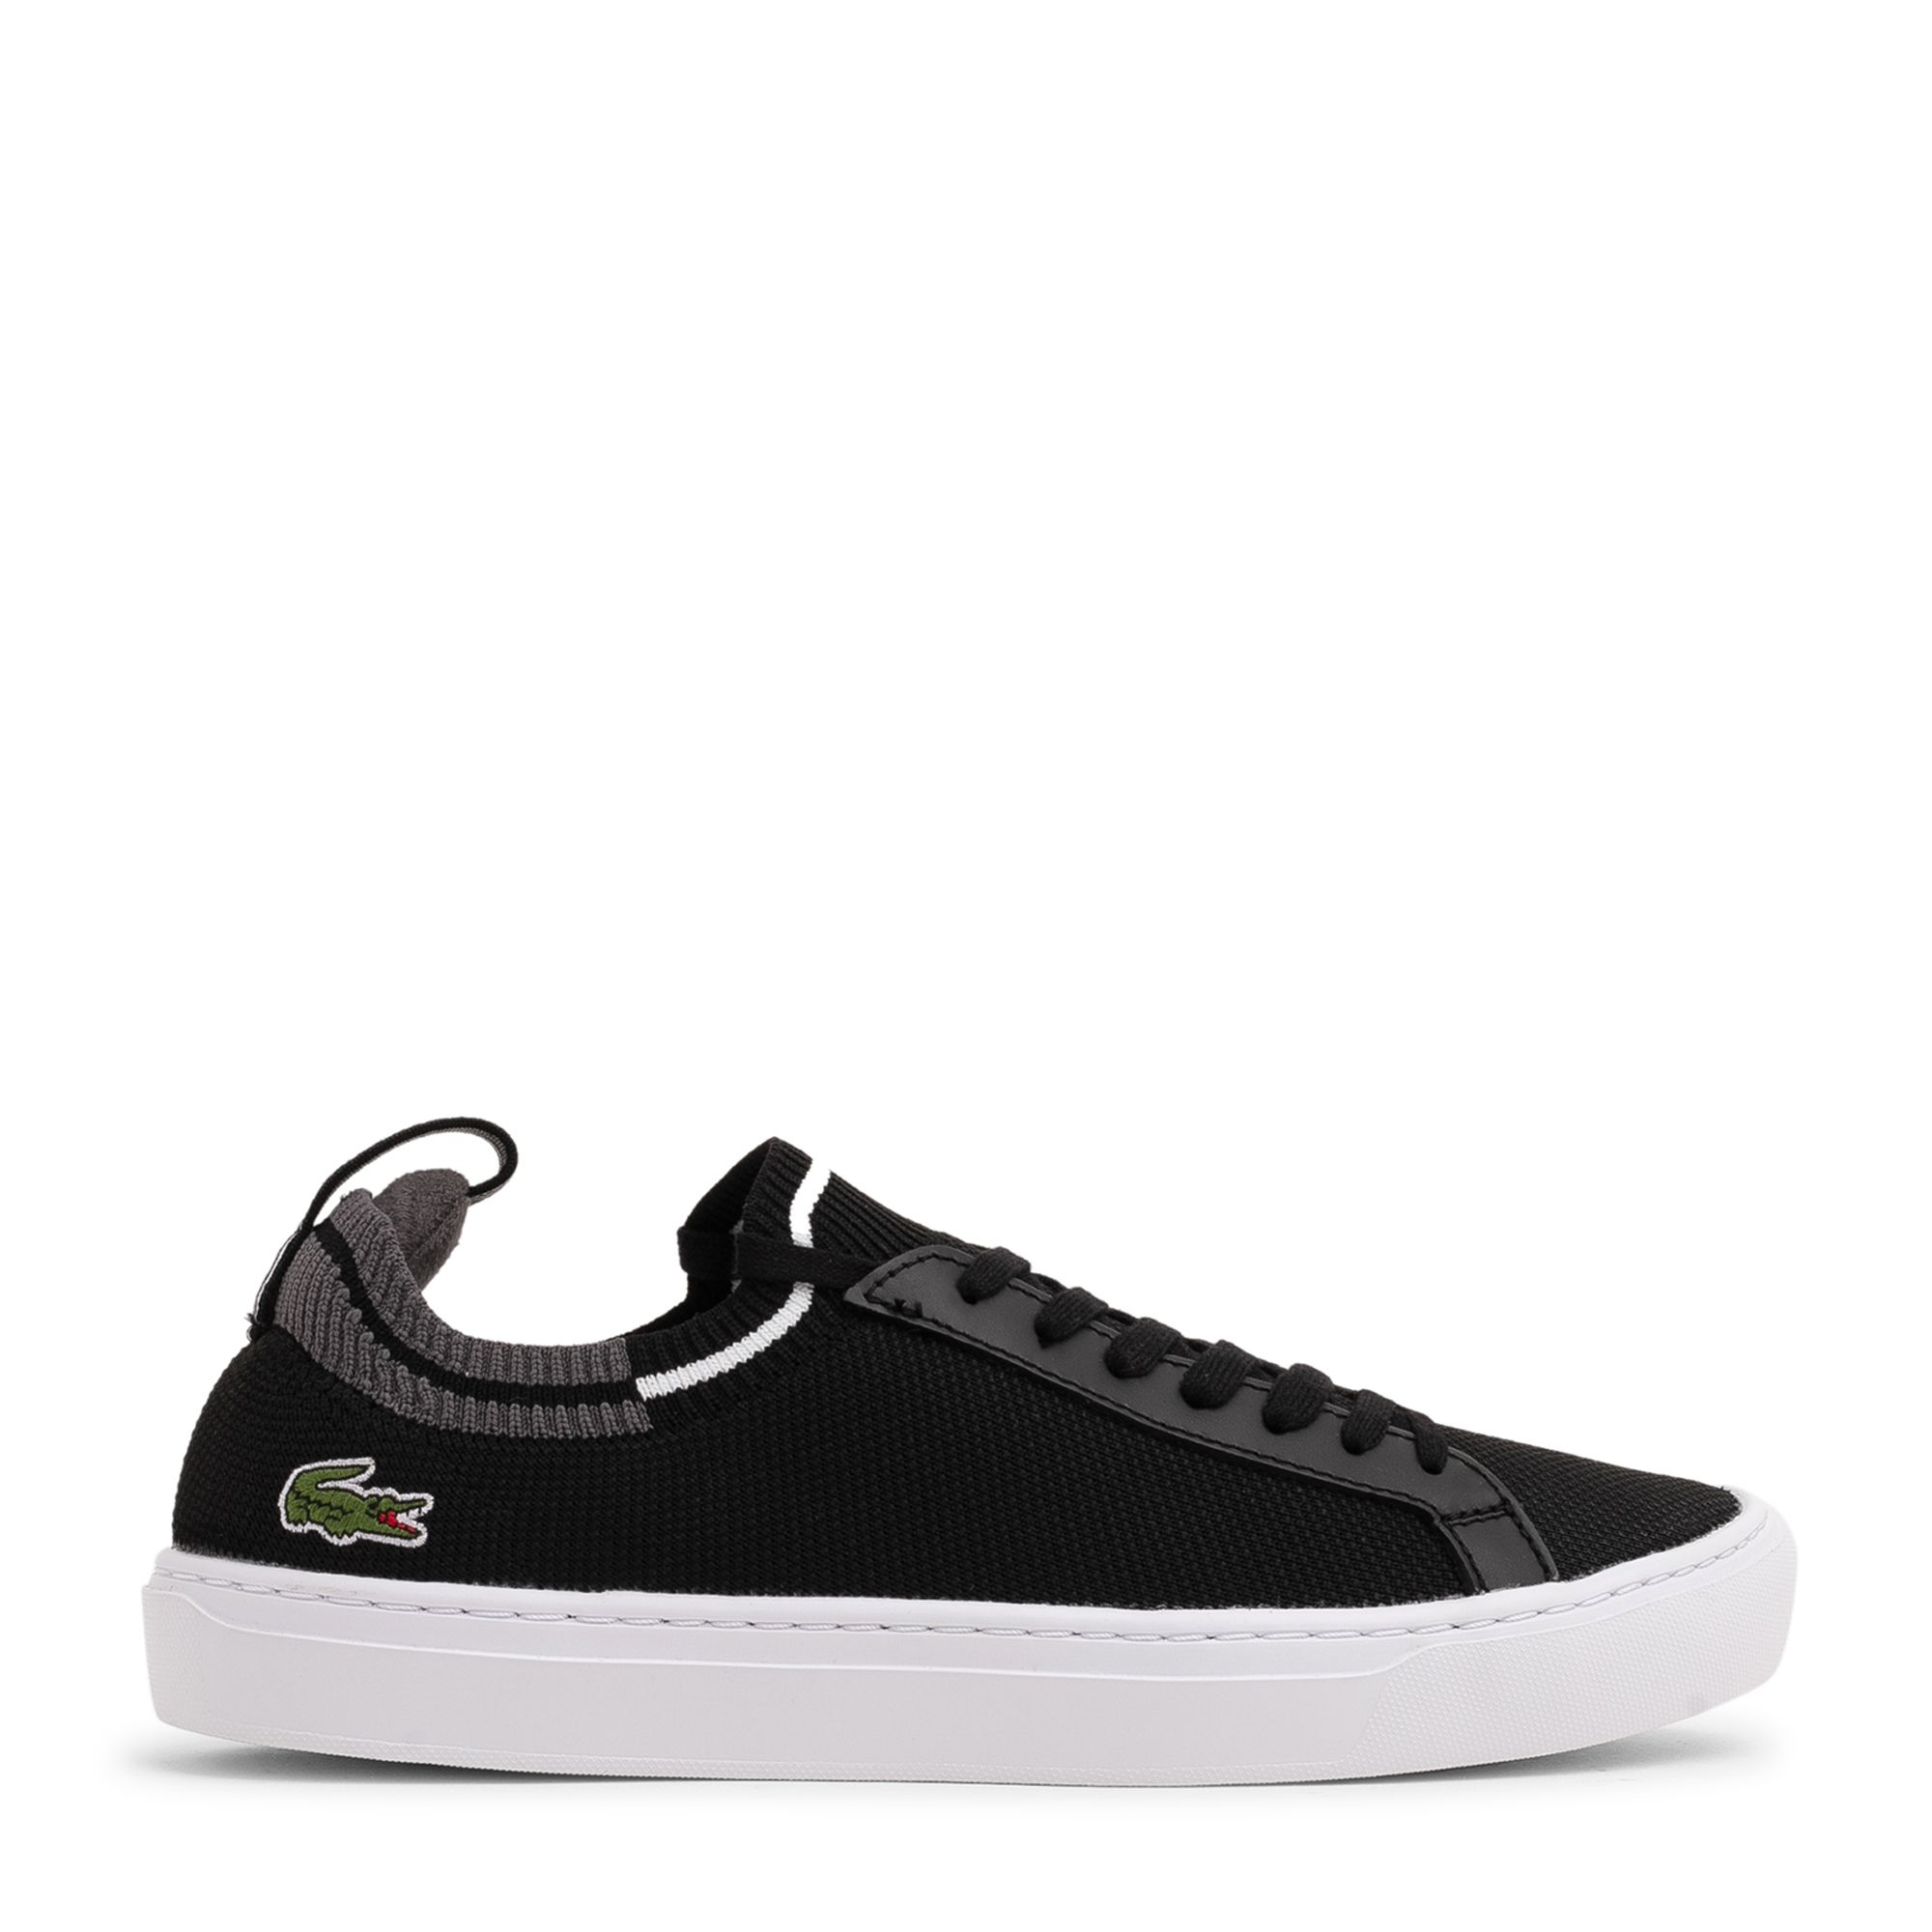 La Piquée sneakers